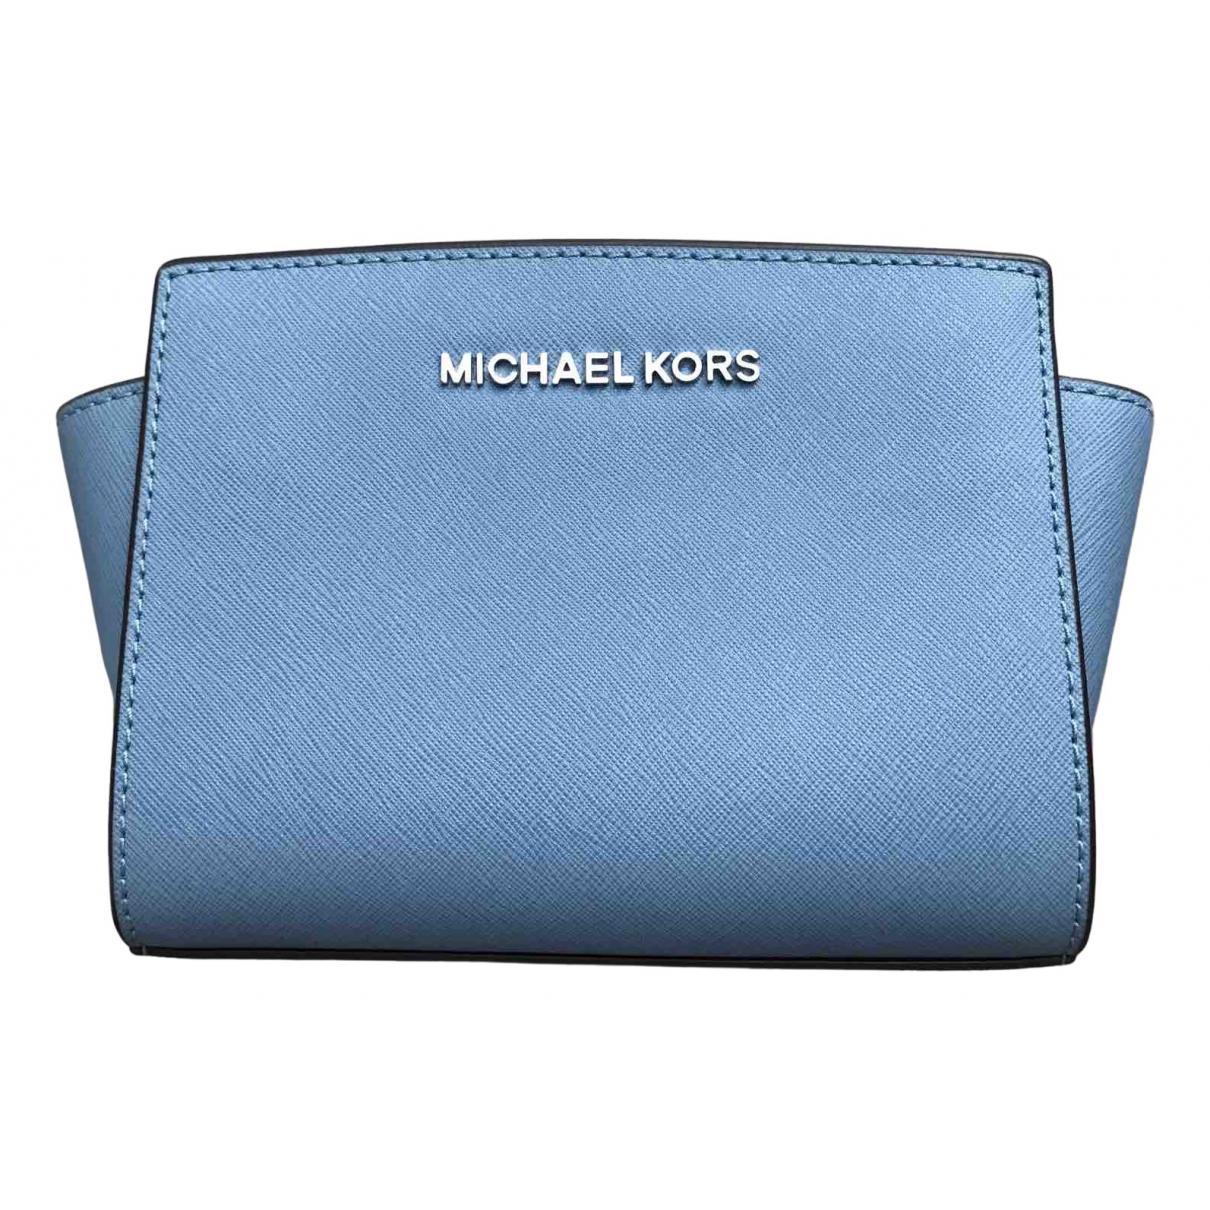 Michael Kors Selma Handtasche in  Blau Leder